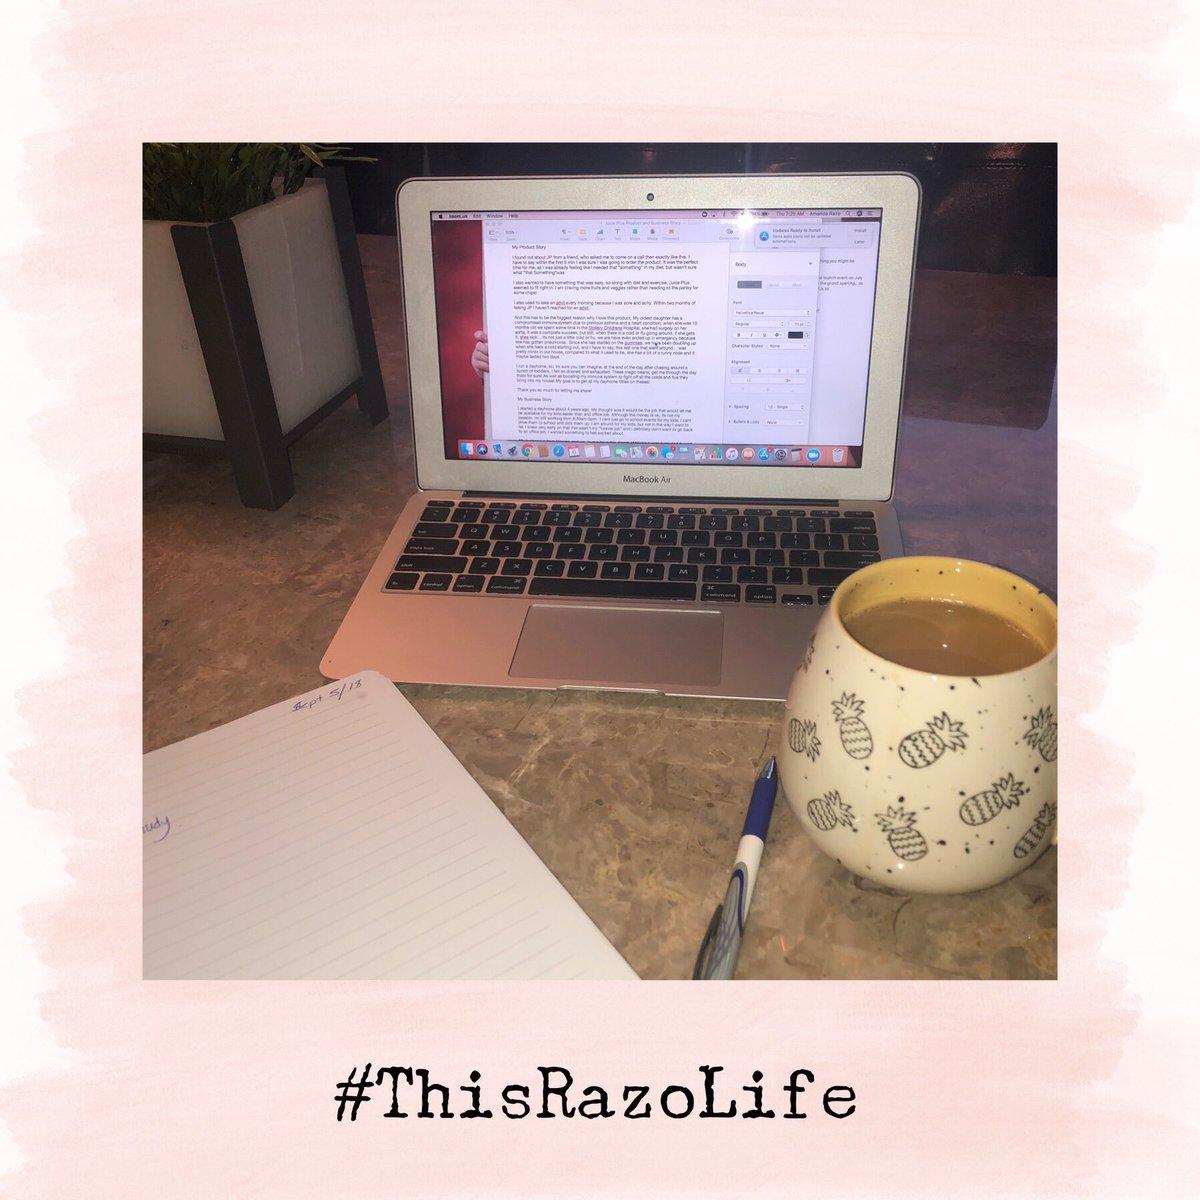 Doing some follow up from a biz call last night! #synsquad #tse #workfromhome #freedomseeker #thisrazolife #jplifestyle #fruitsandveggiespic.twitter.com/GhlaqQbQYn